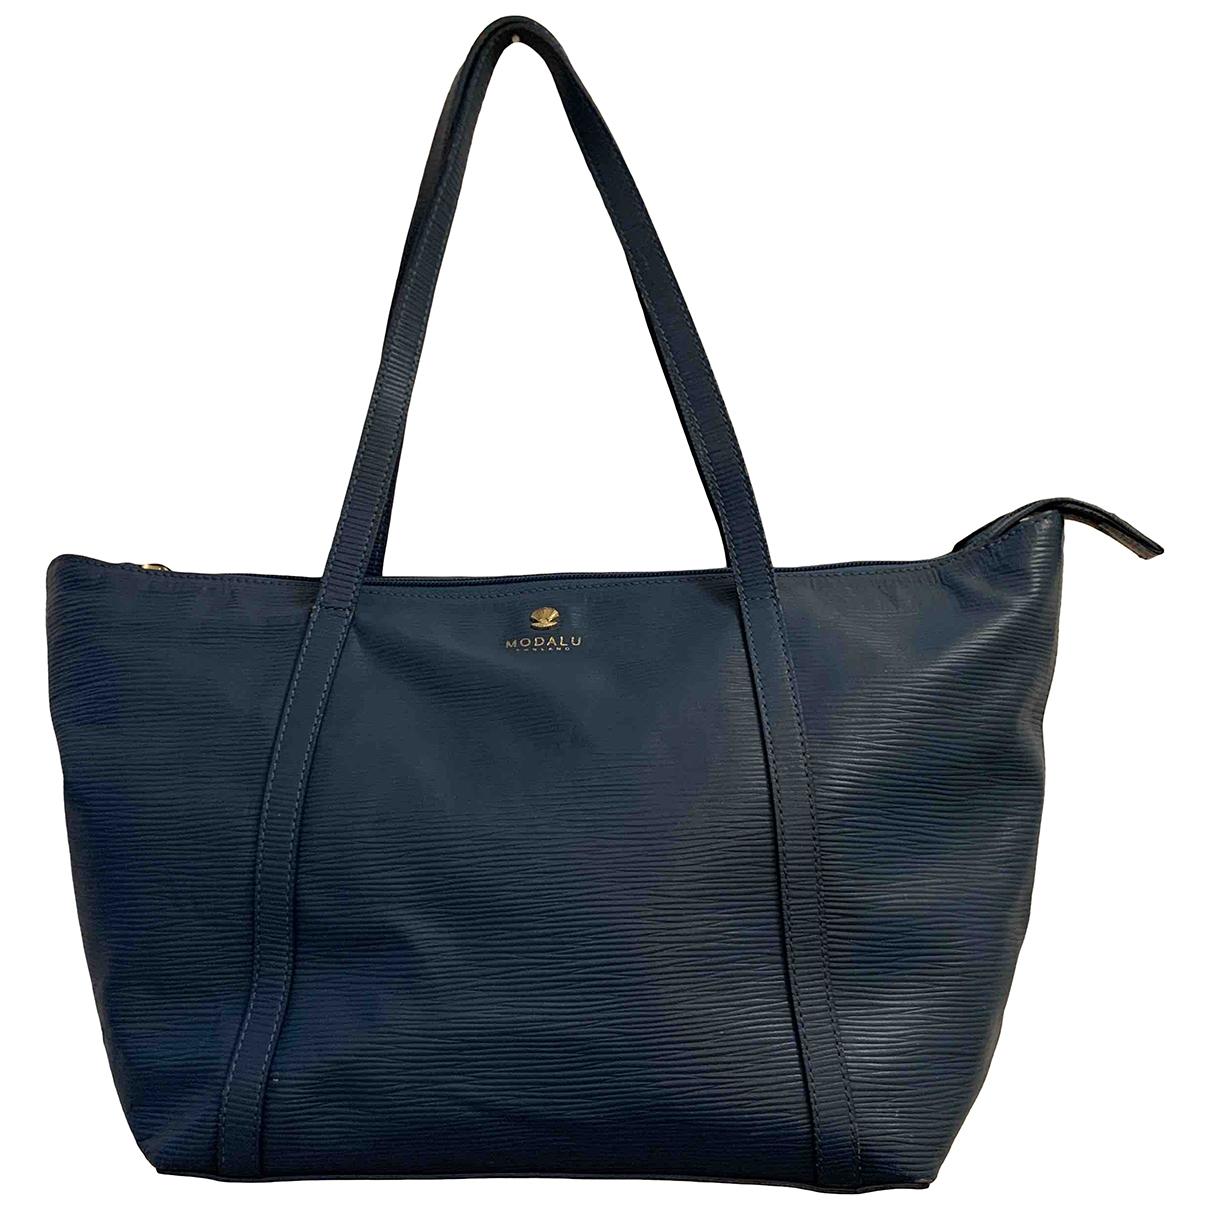 Modalu - Sac a main   pour femme en cuir - bleu